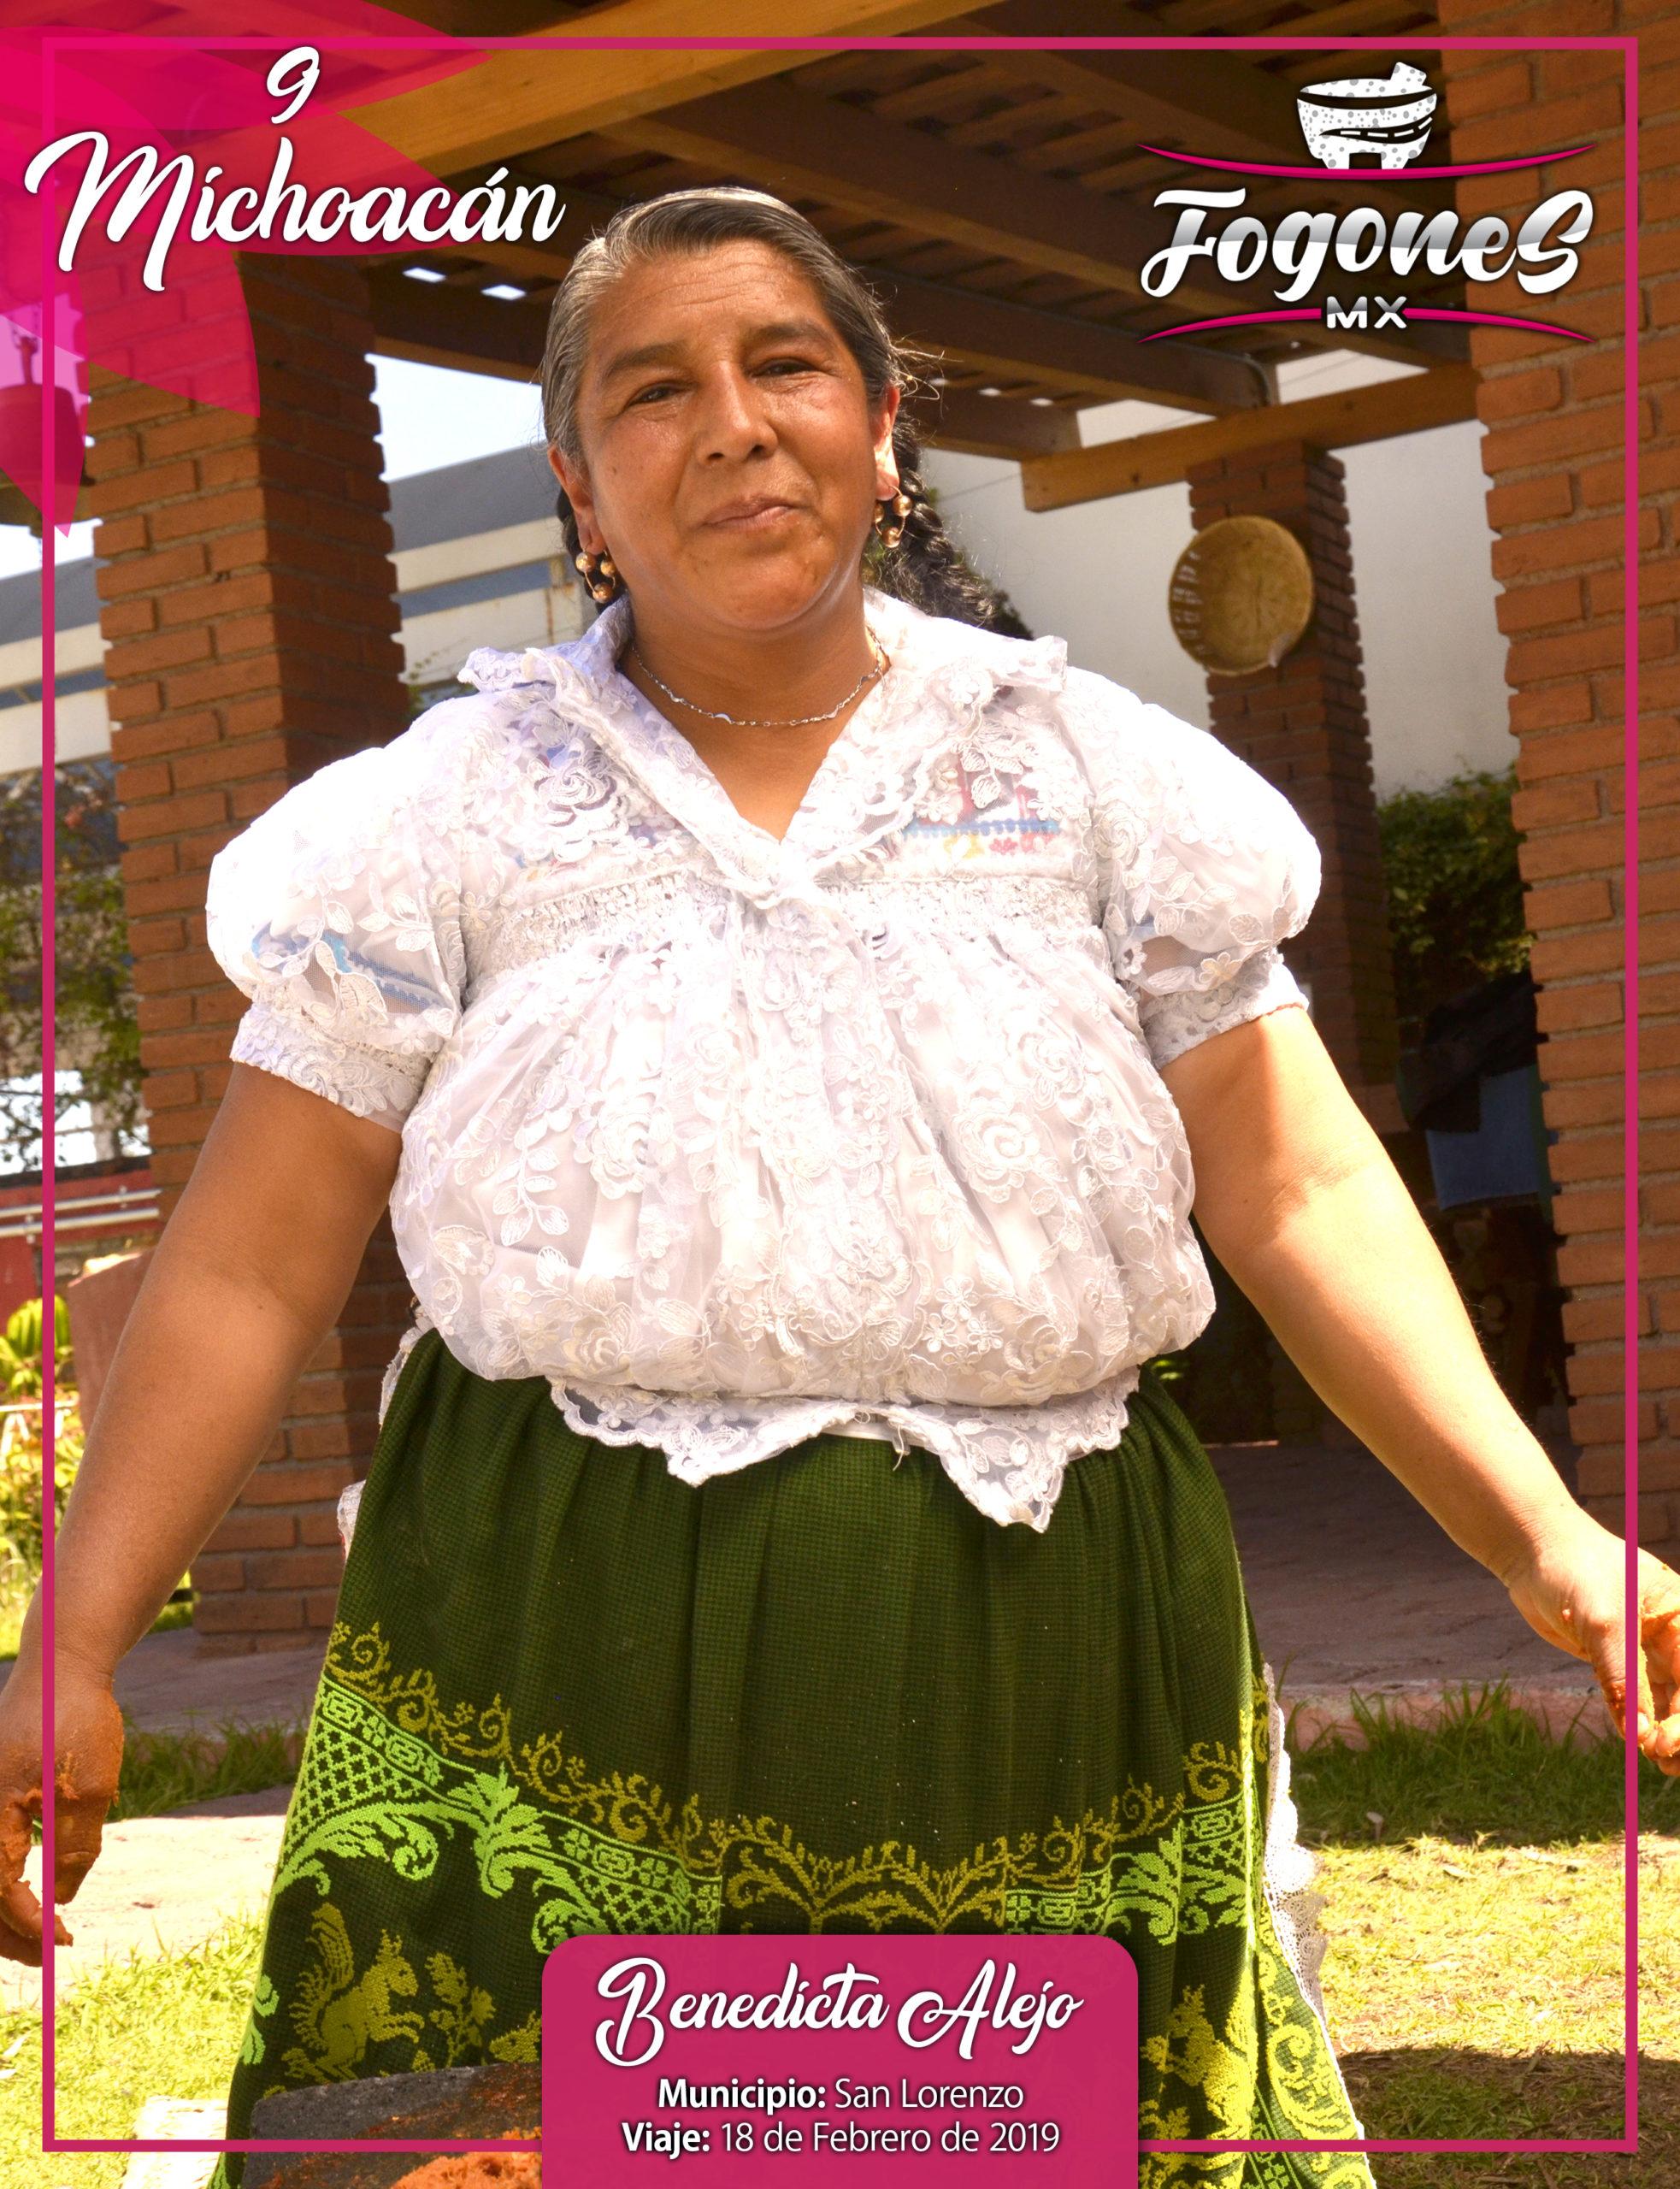 9 - michoacan